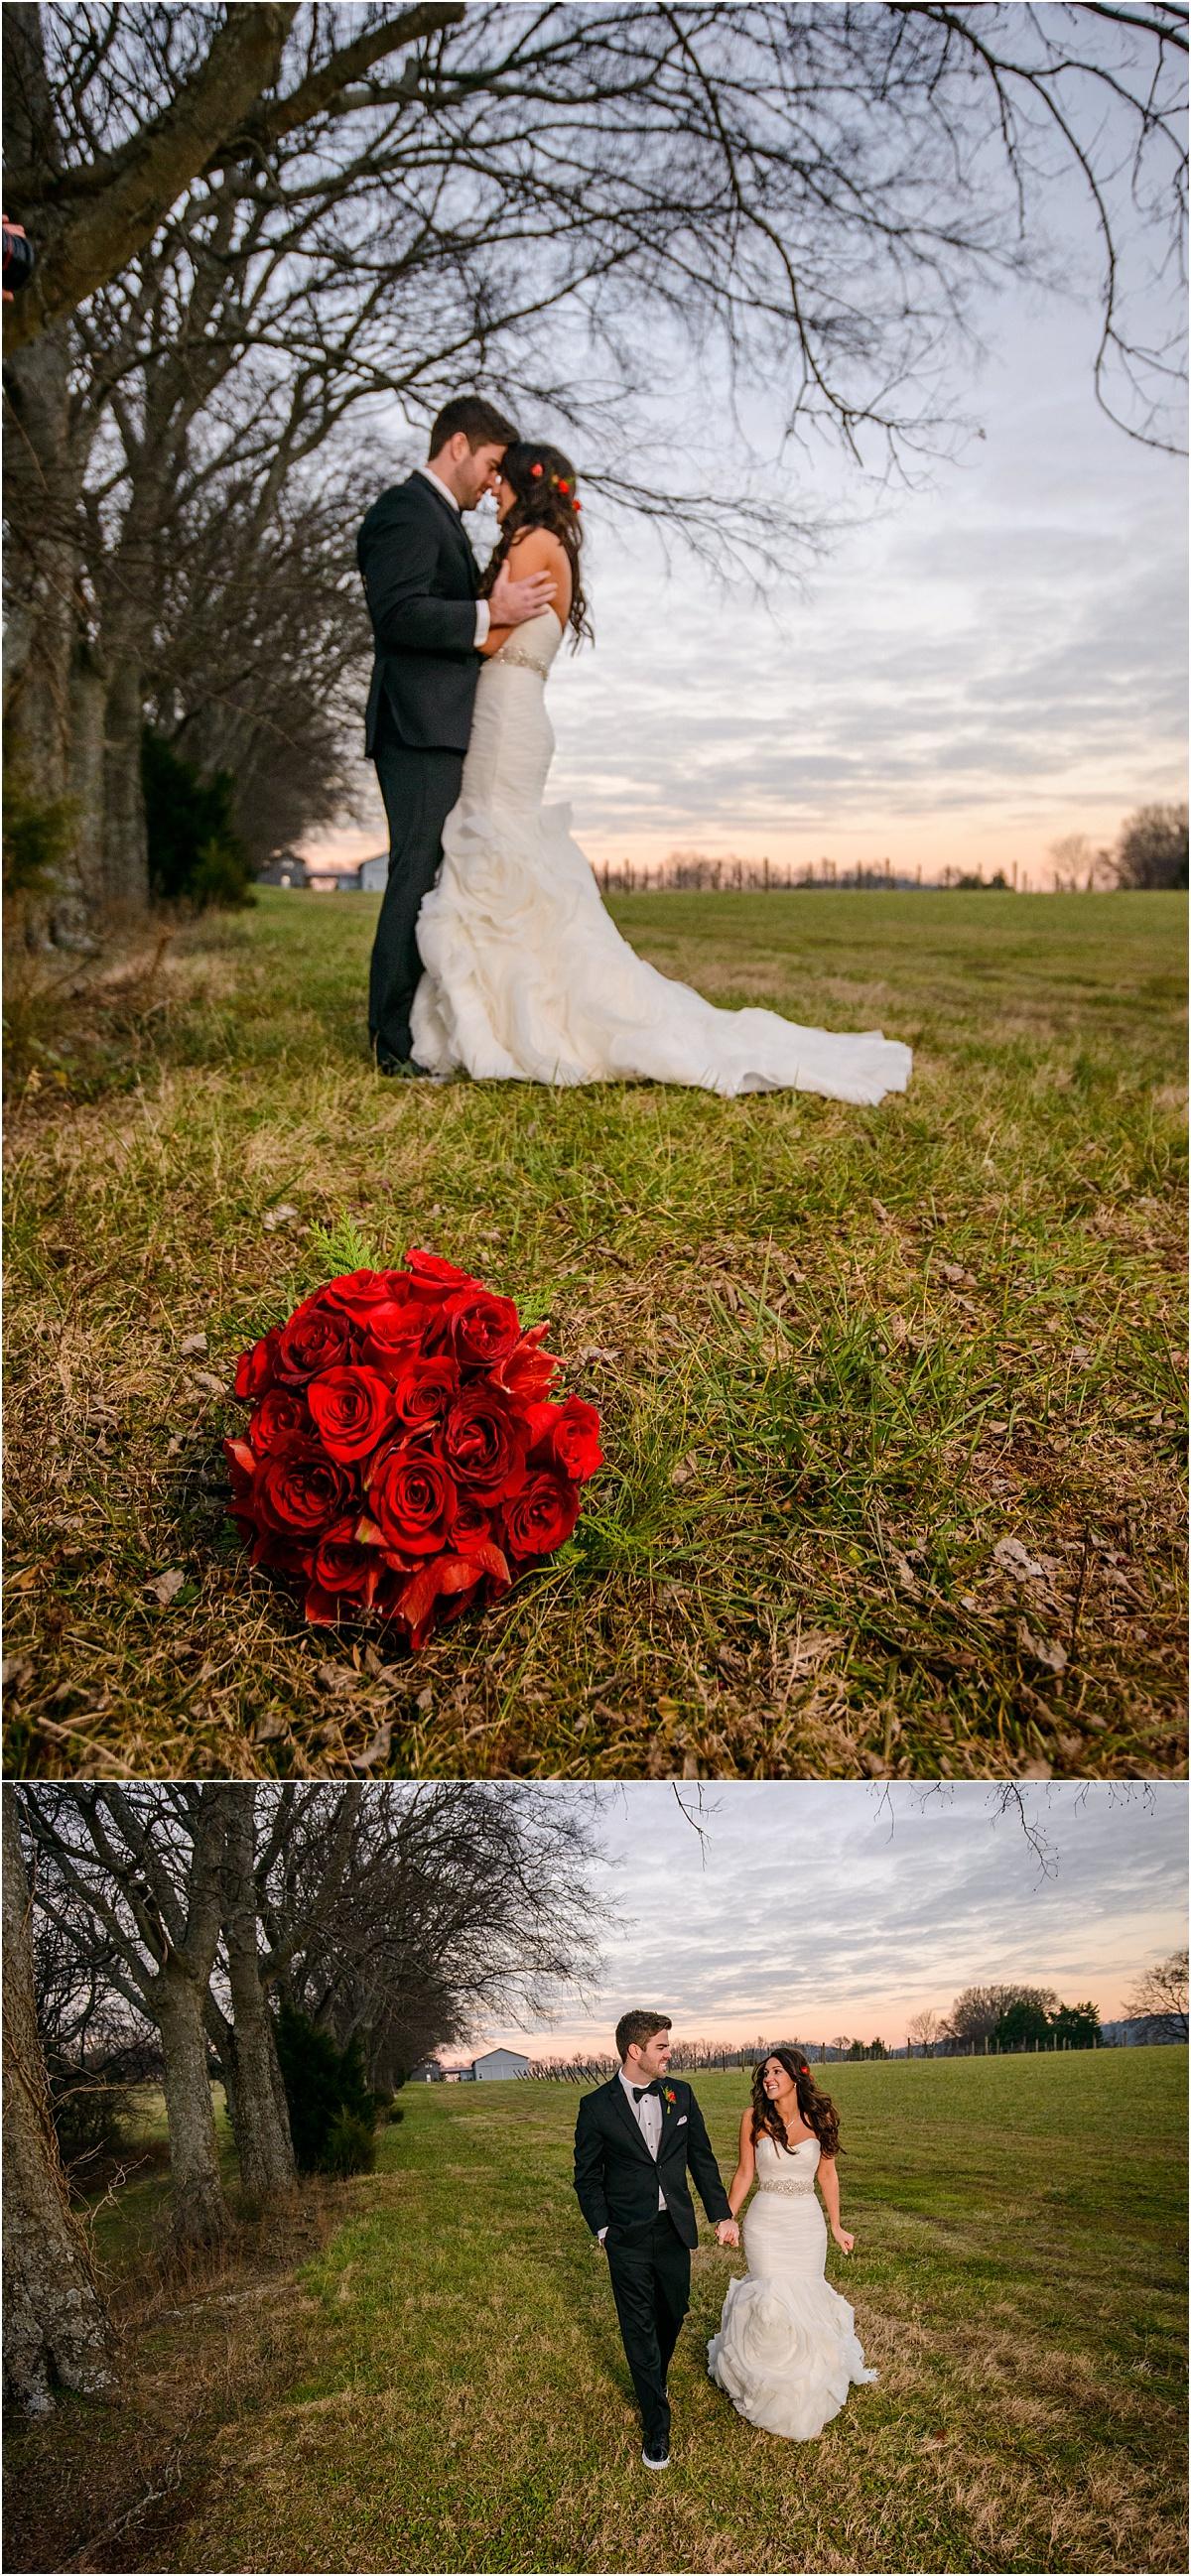 Greg Smit Photography Nashville wedding photographer Mint Springs Farm_0020